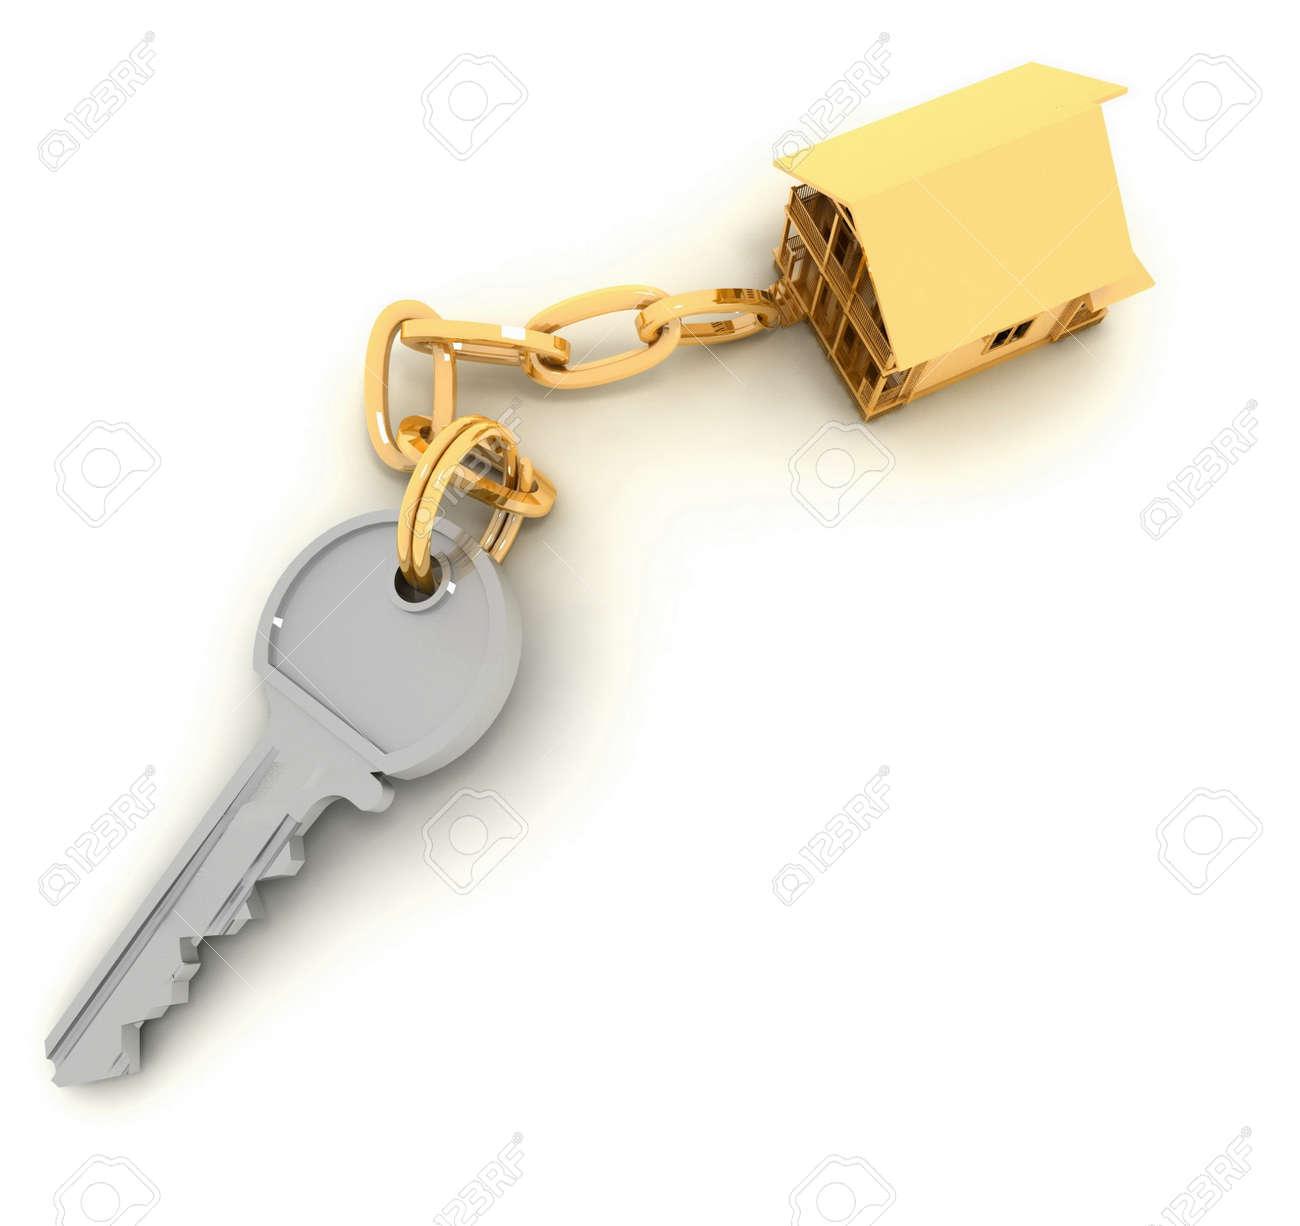 house key on the white background Stock Photo - 11985110